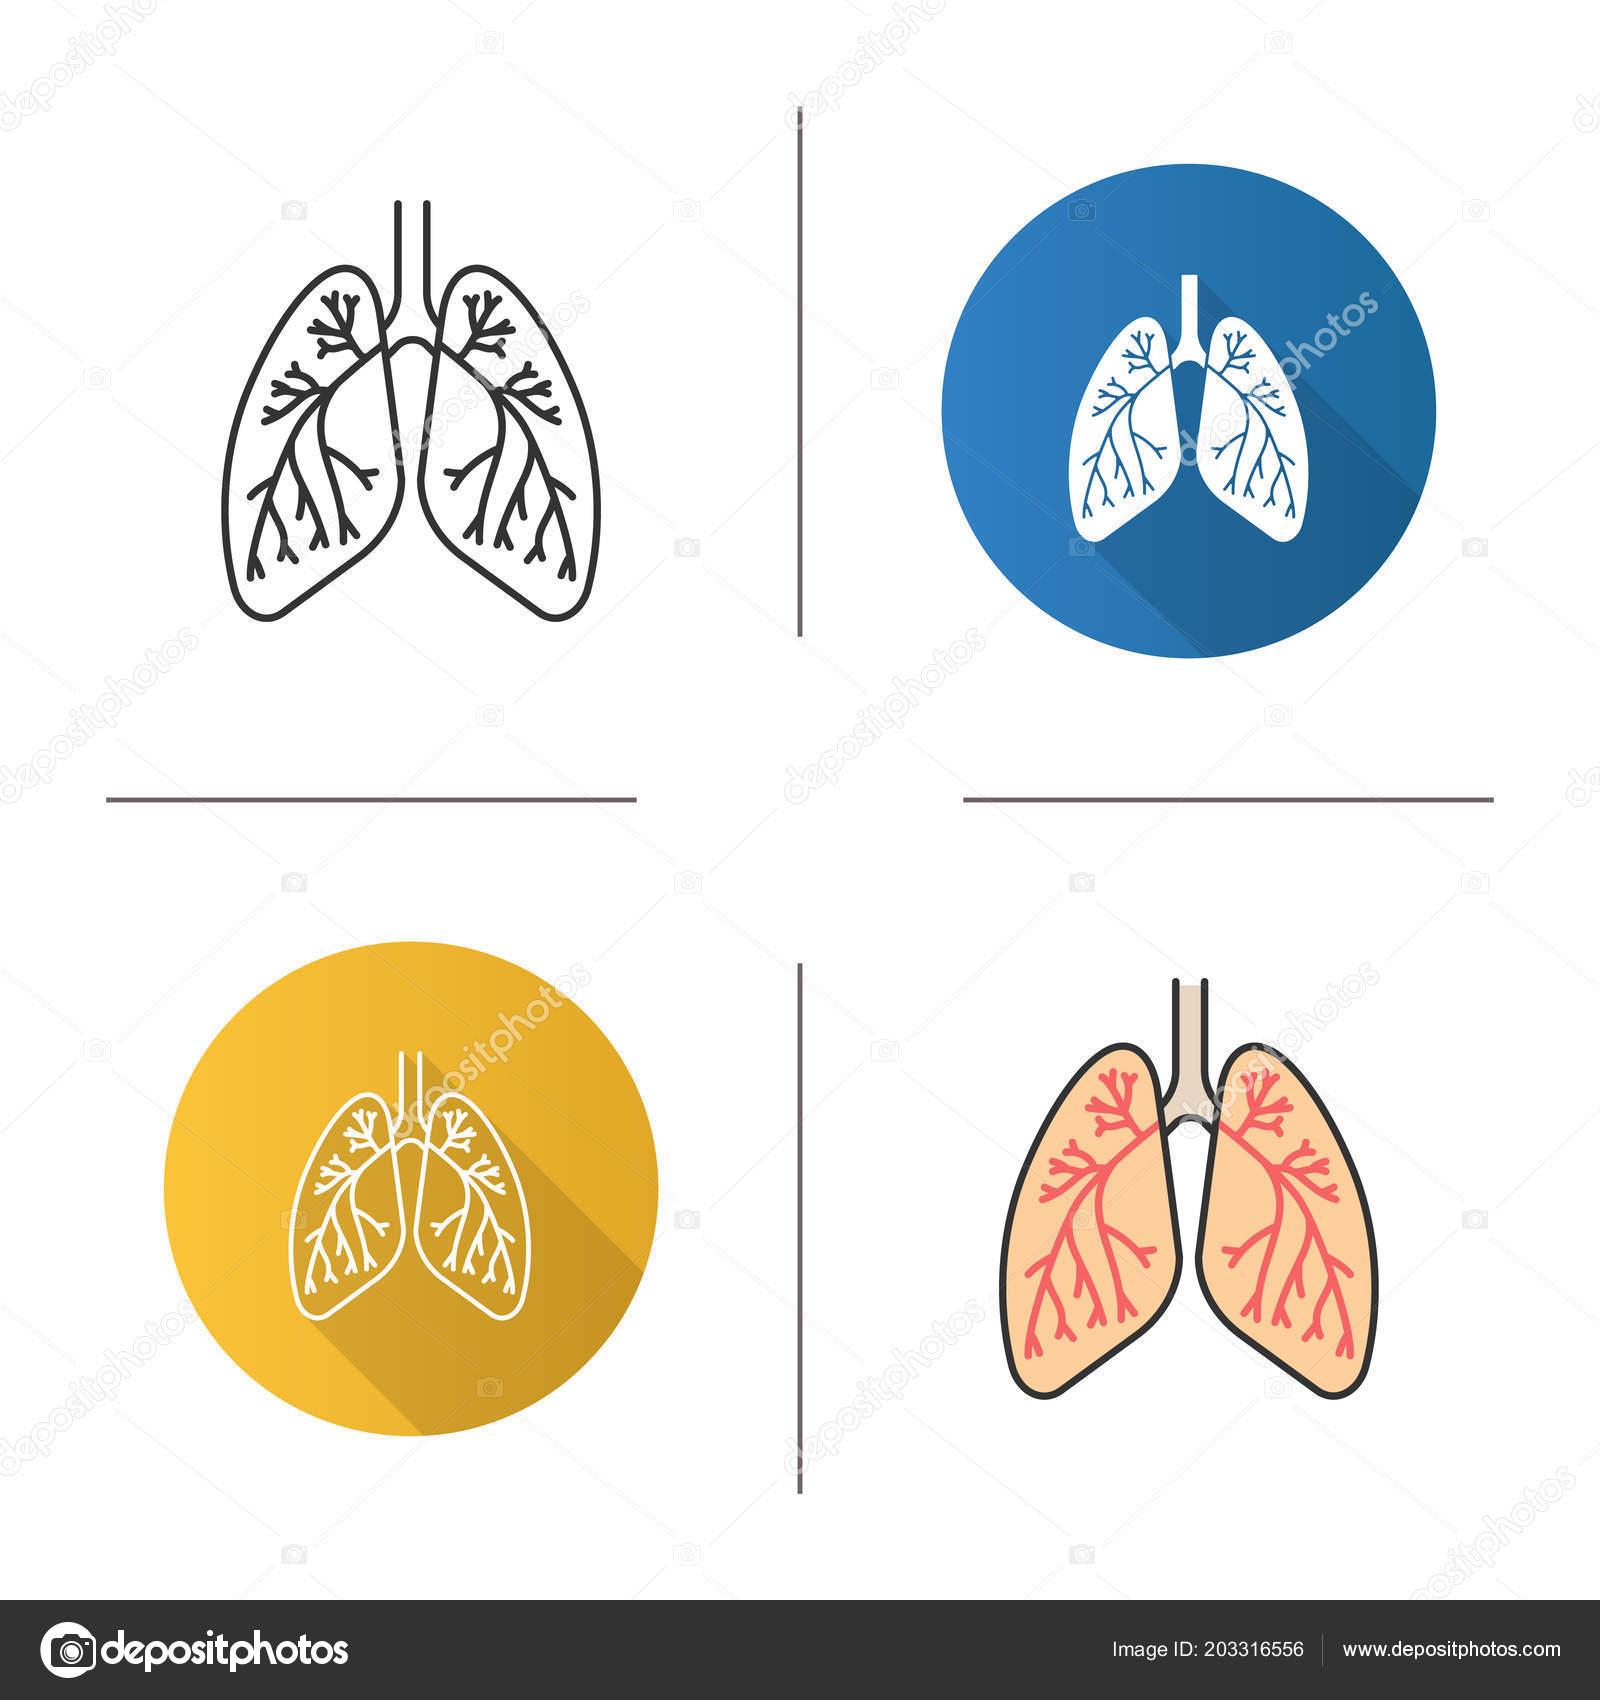 Human Lungs Bronchi Bronchioles Icon Respiratory System Anatomy Flat